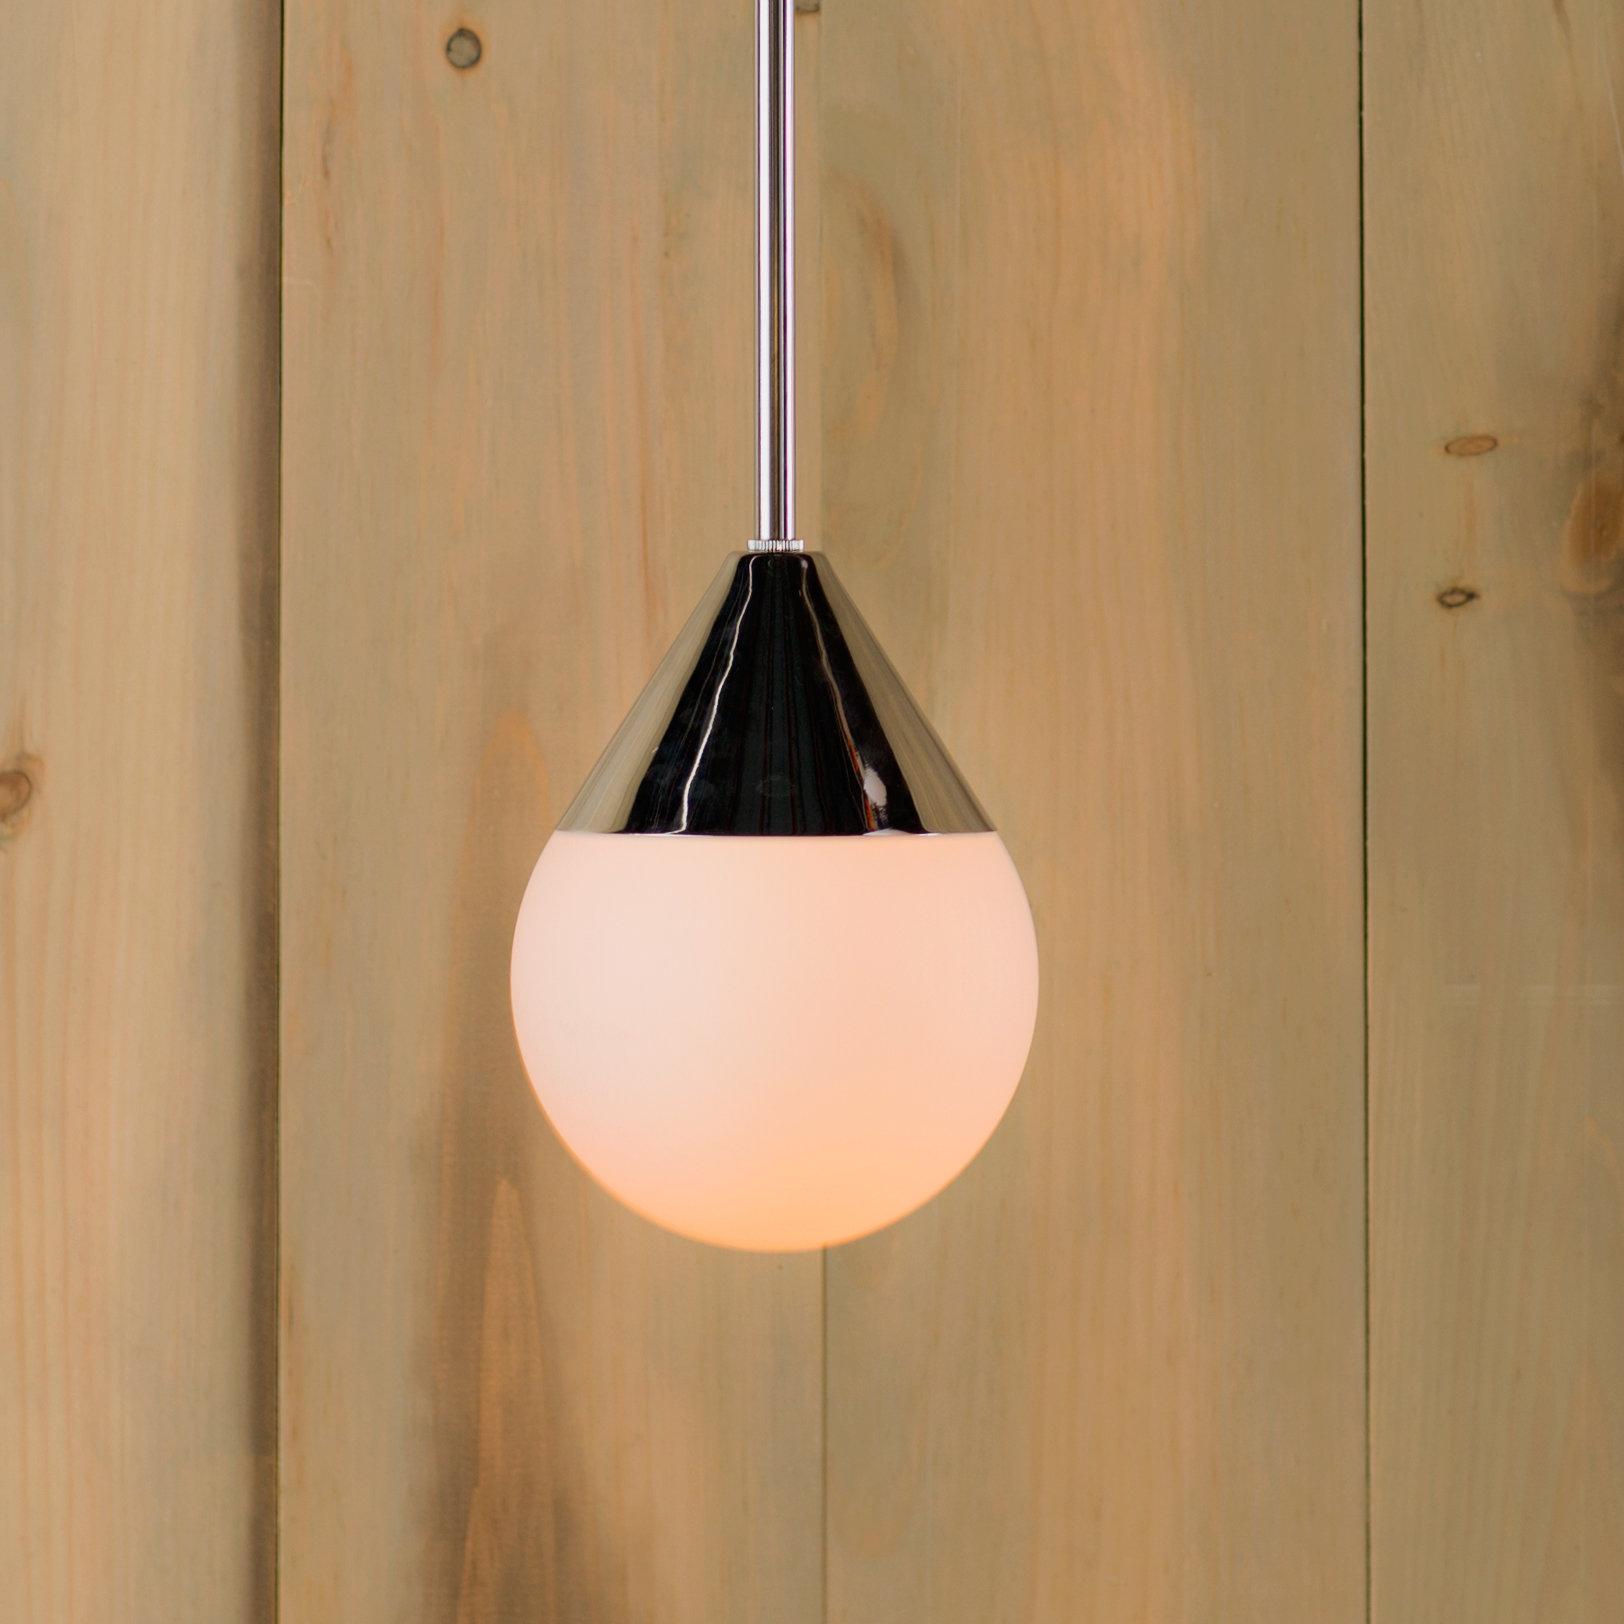 Best And Newest Prange 1 Light Single Globe Pendants For Ledford 1 Light Single Globe Pendant (View 2 of 20)